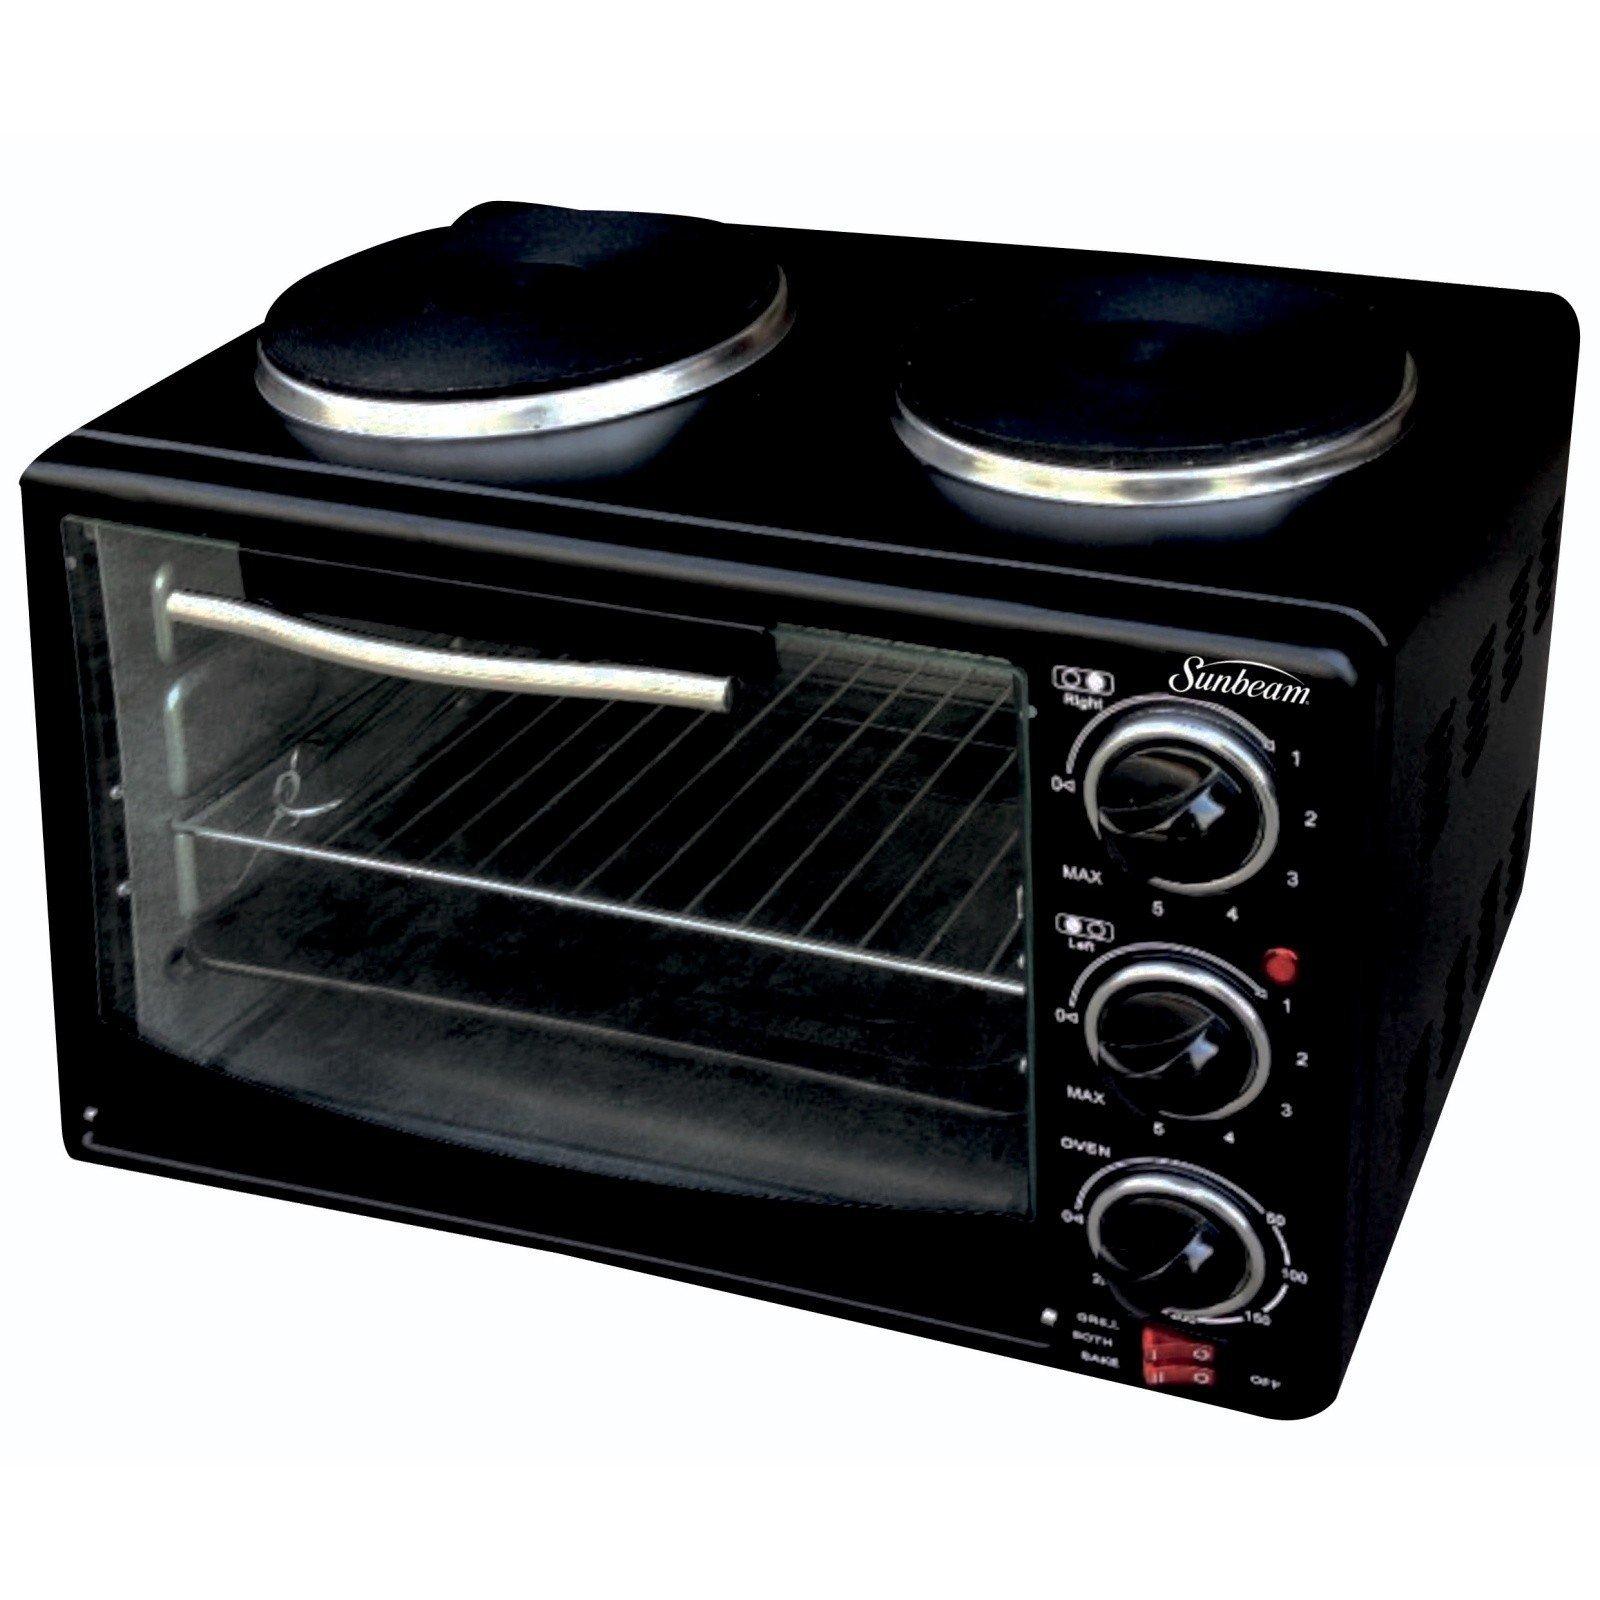 Sunbeam 20l Compact Oven Prices Shop Deals Online